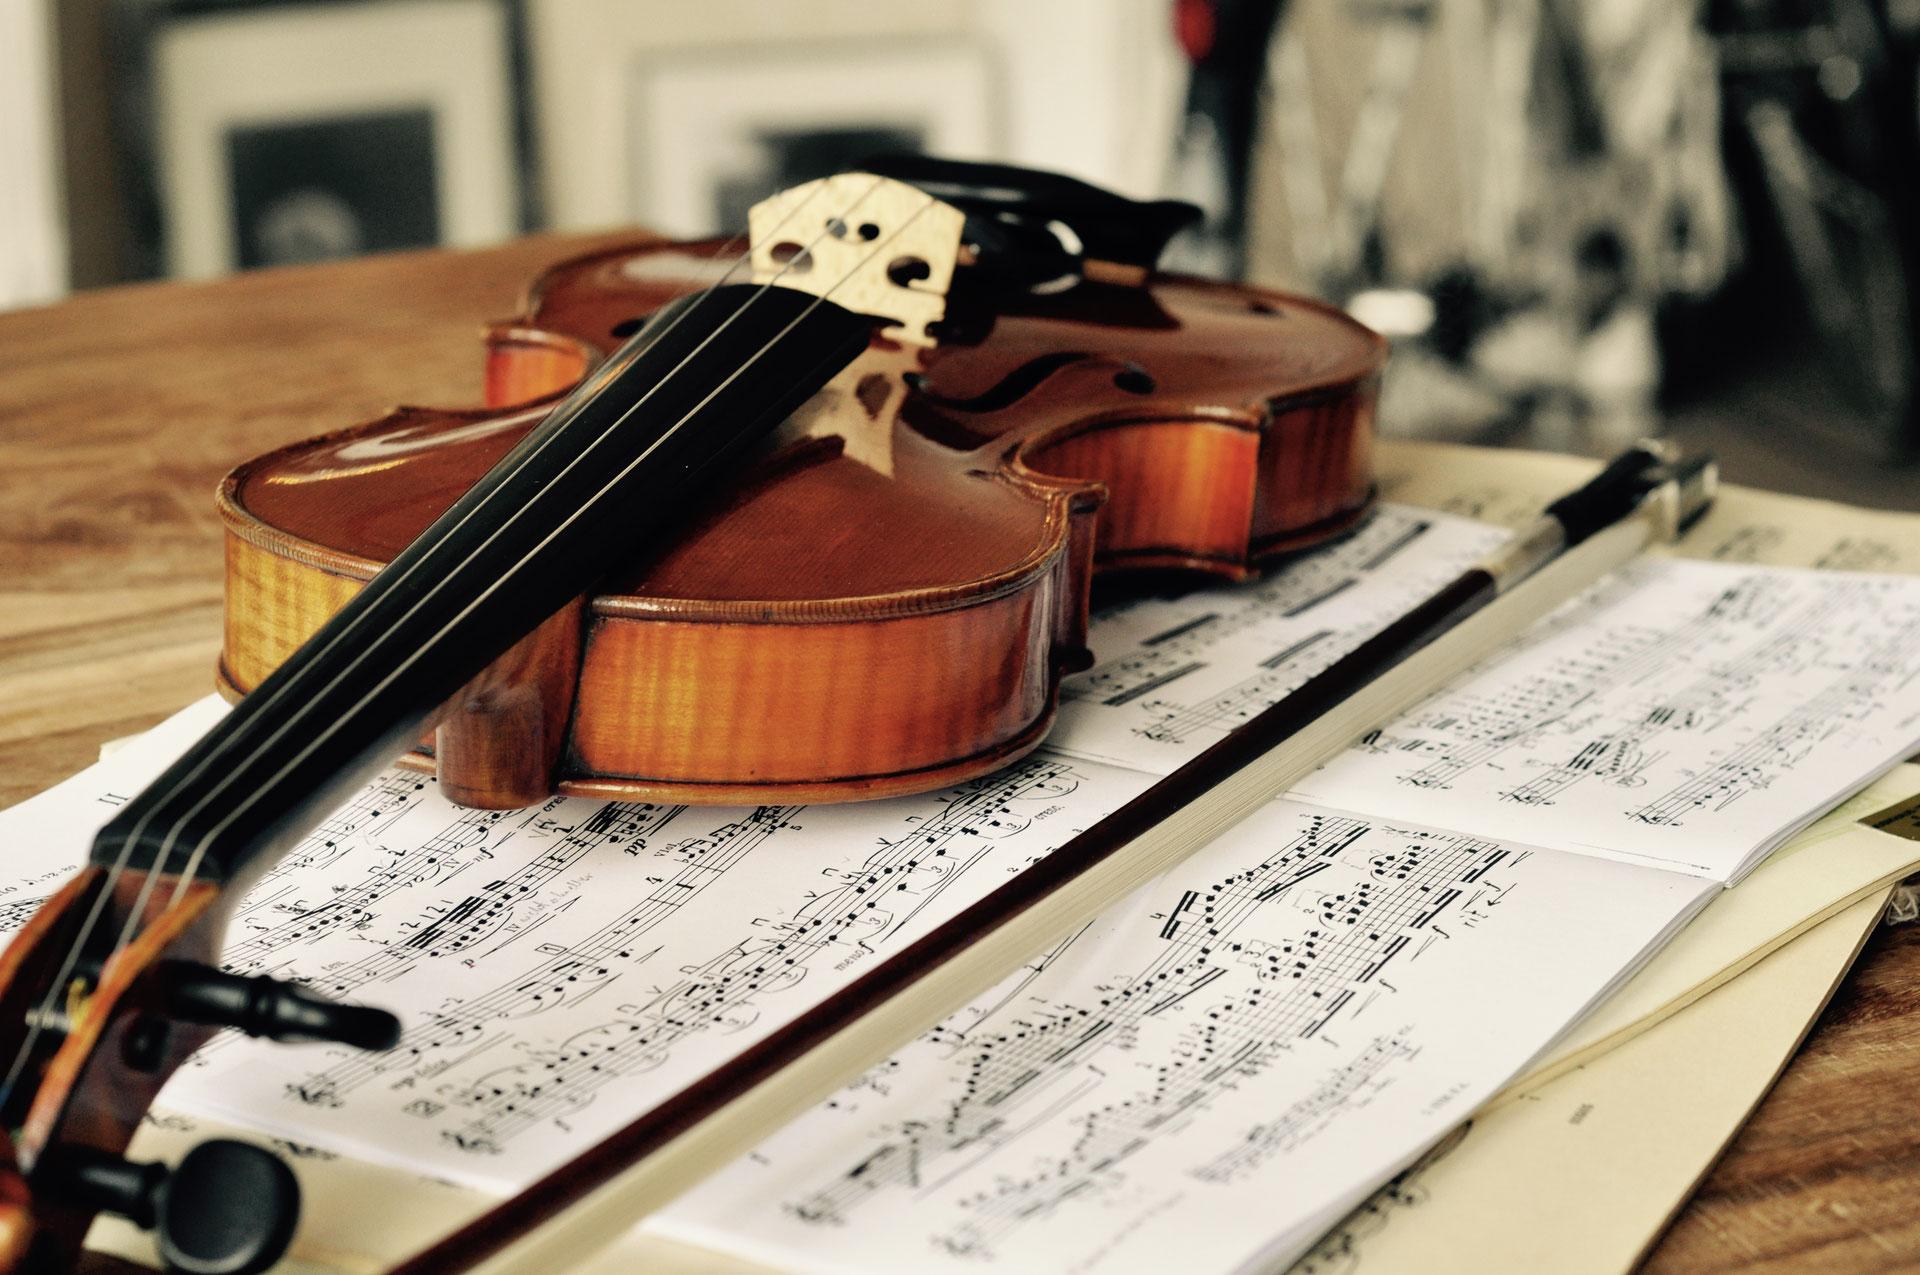 REFERENCES - AnnaSophiaLang Musik, Bild, Sprache